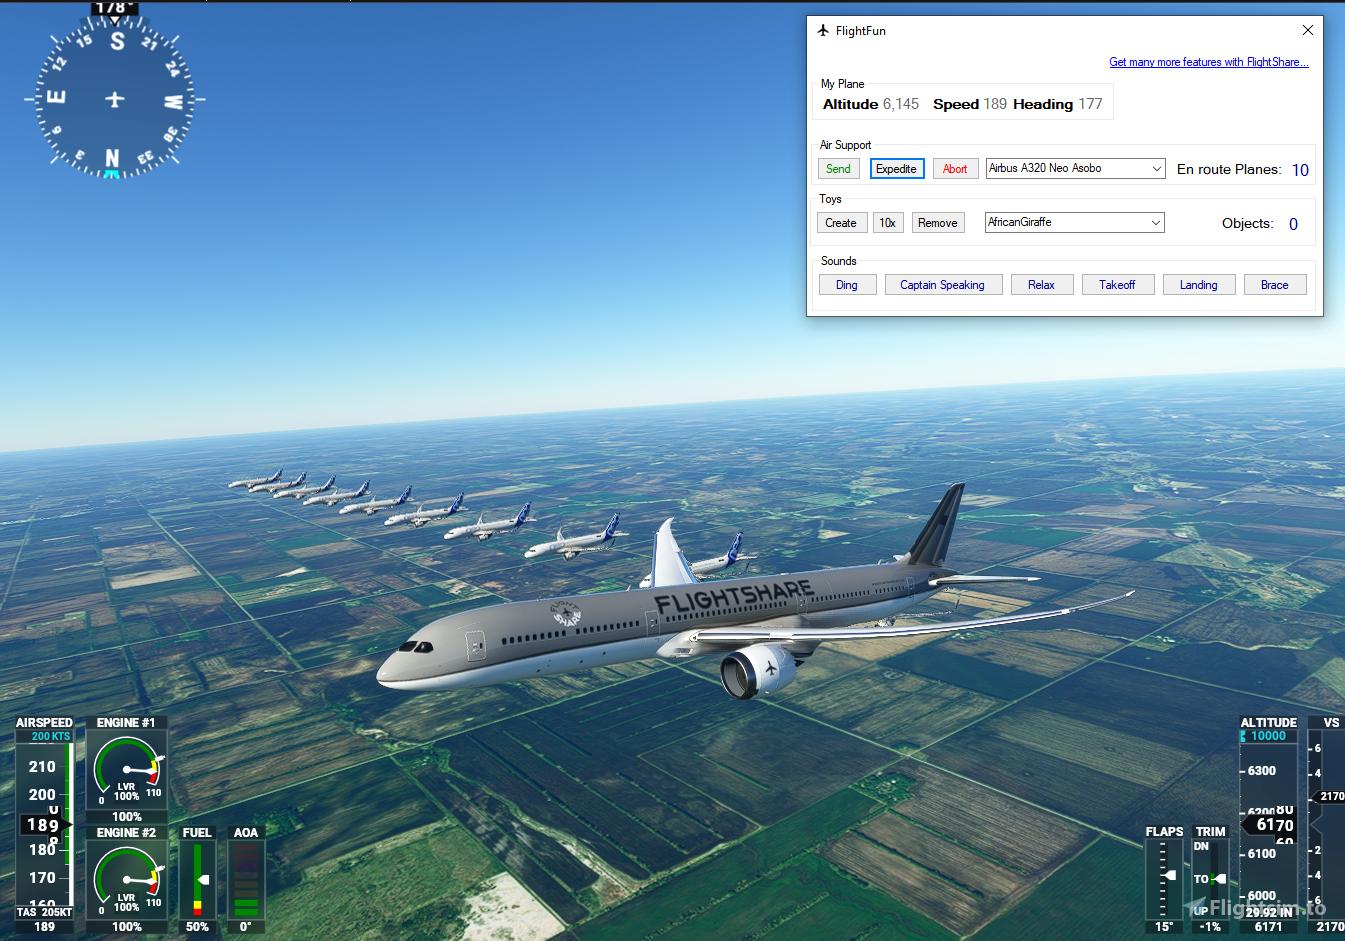 FlightFun Flight Simulator 2020